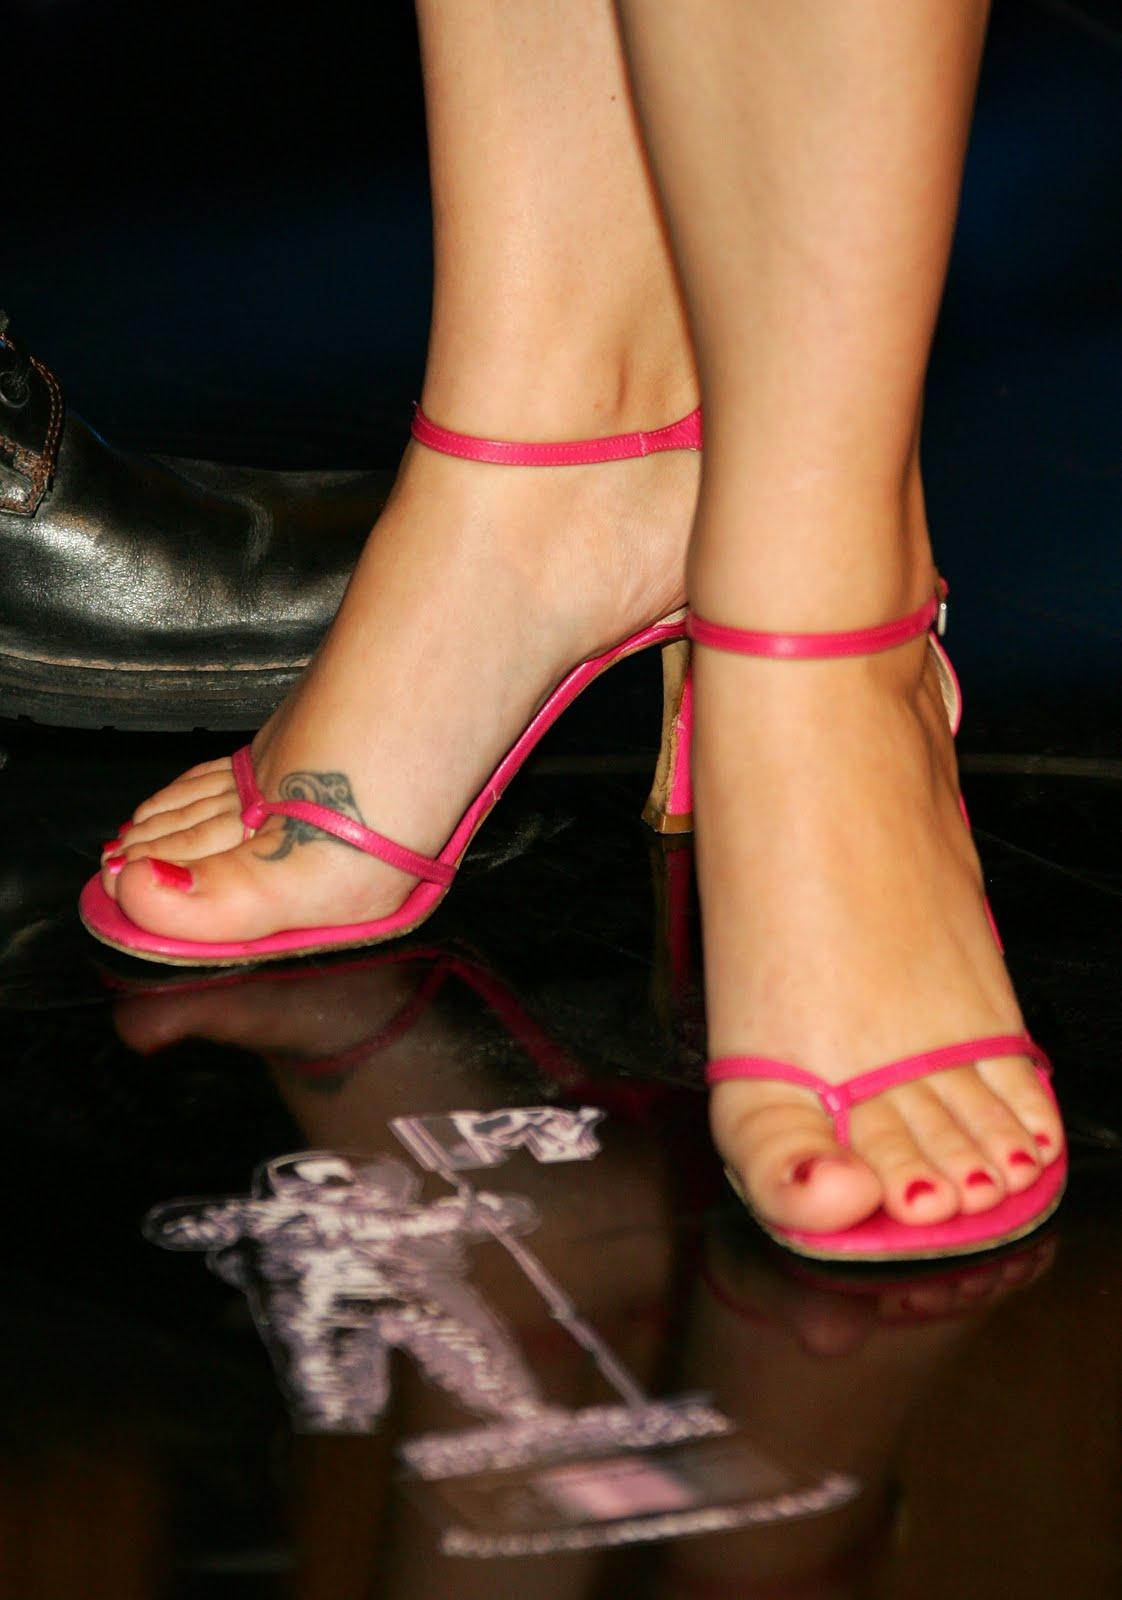 http://4.bp.blogspot.com/_UaLWp72nij4/TAlhehjK3NI/AAAAAAAAN2I/NWv05vX90pQ/s1600/melissa-joan-hart-feet-2.jpg